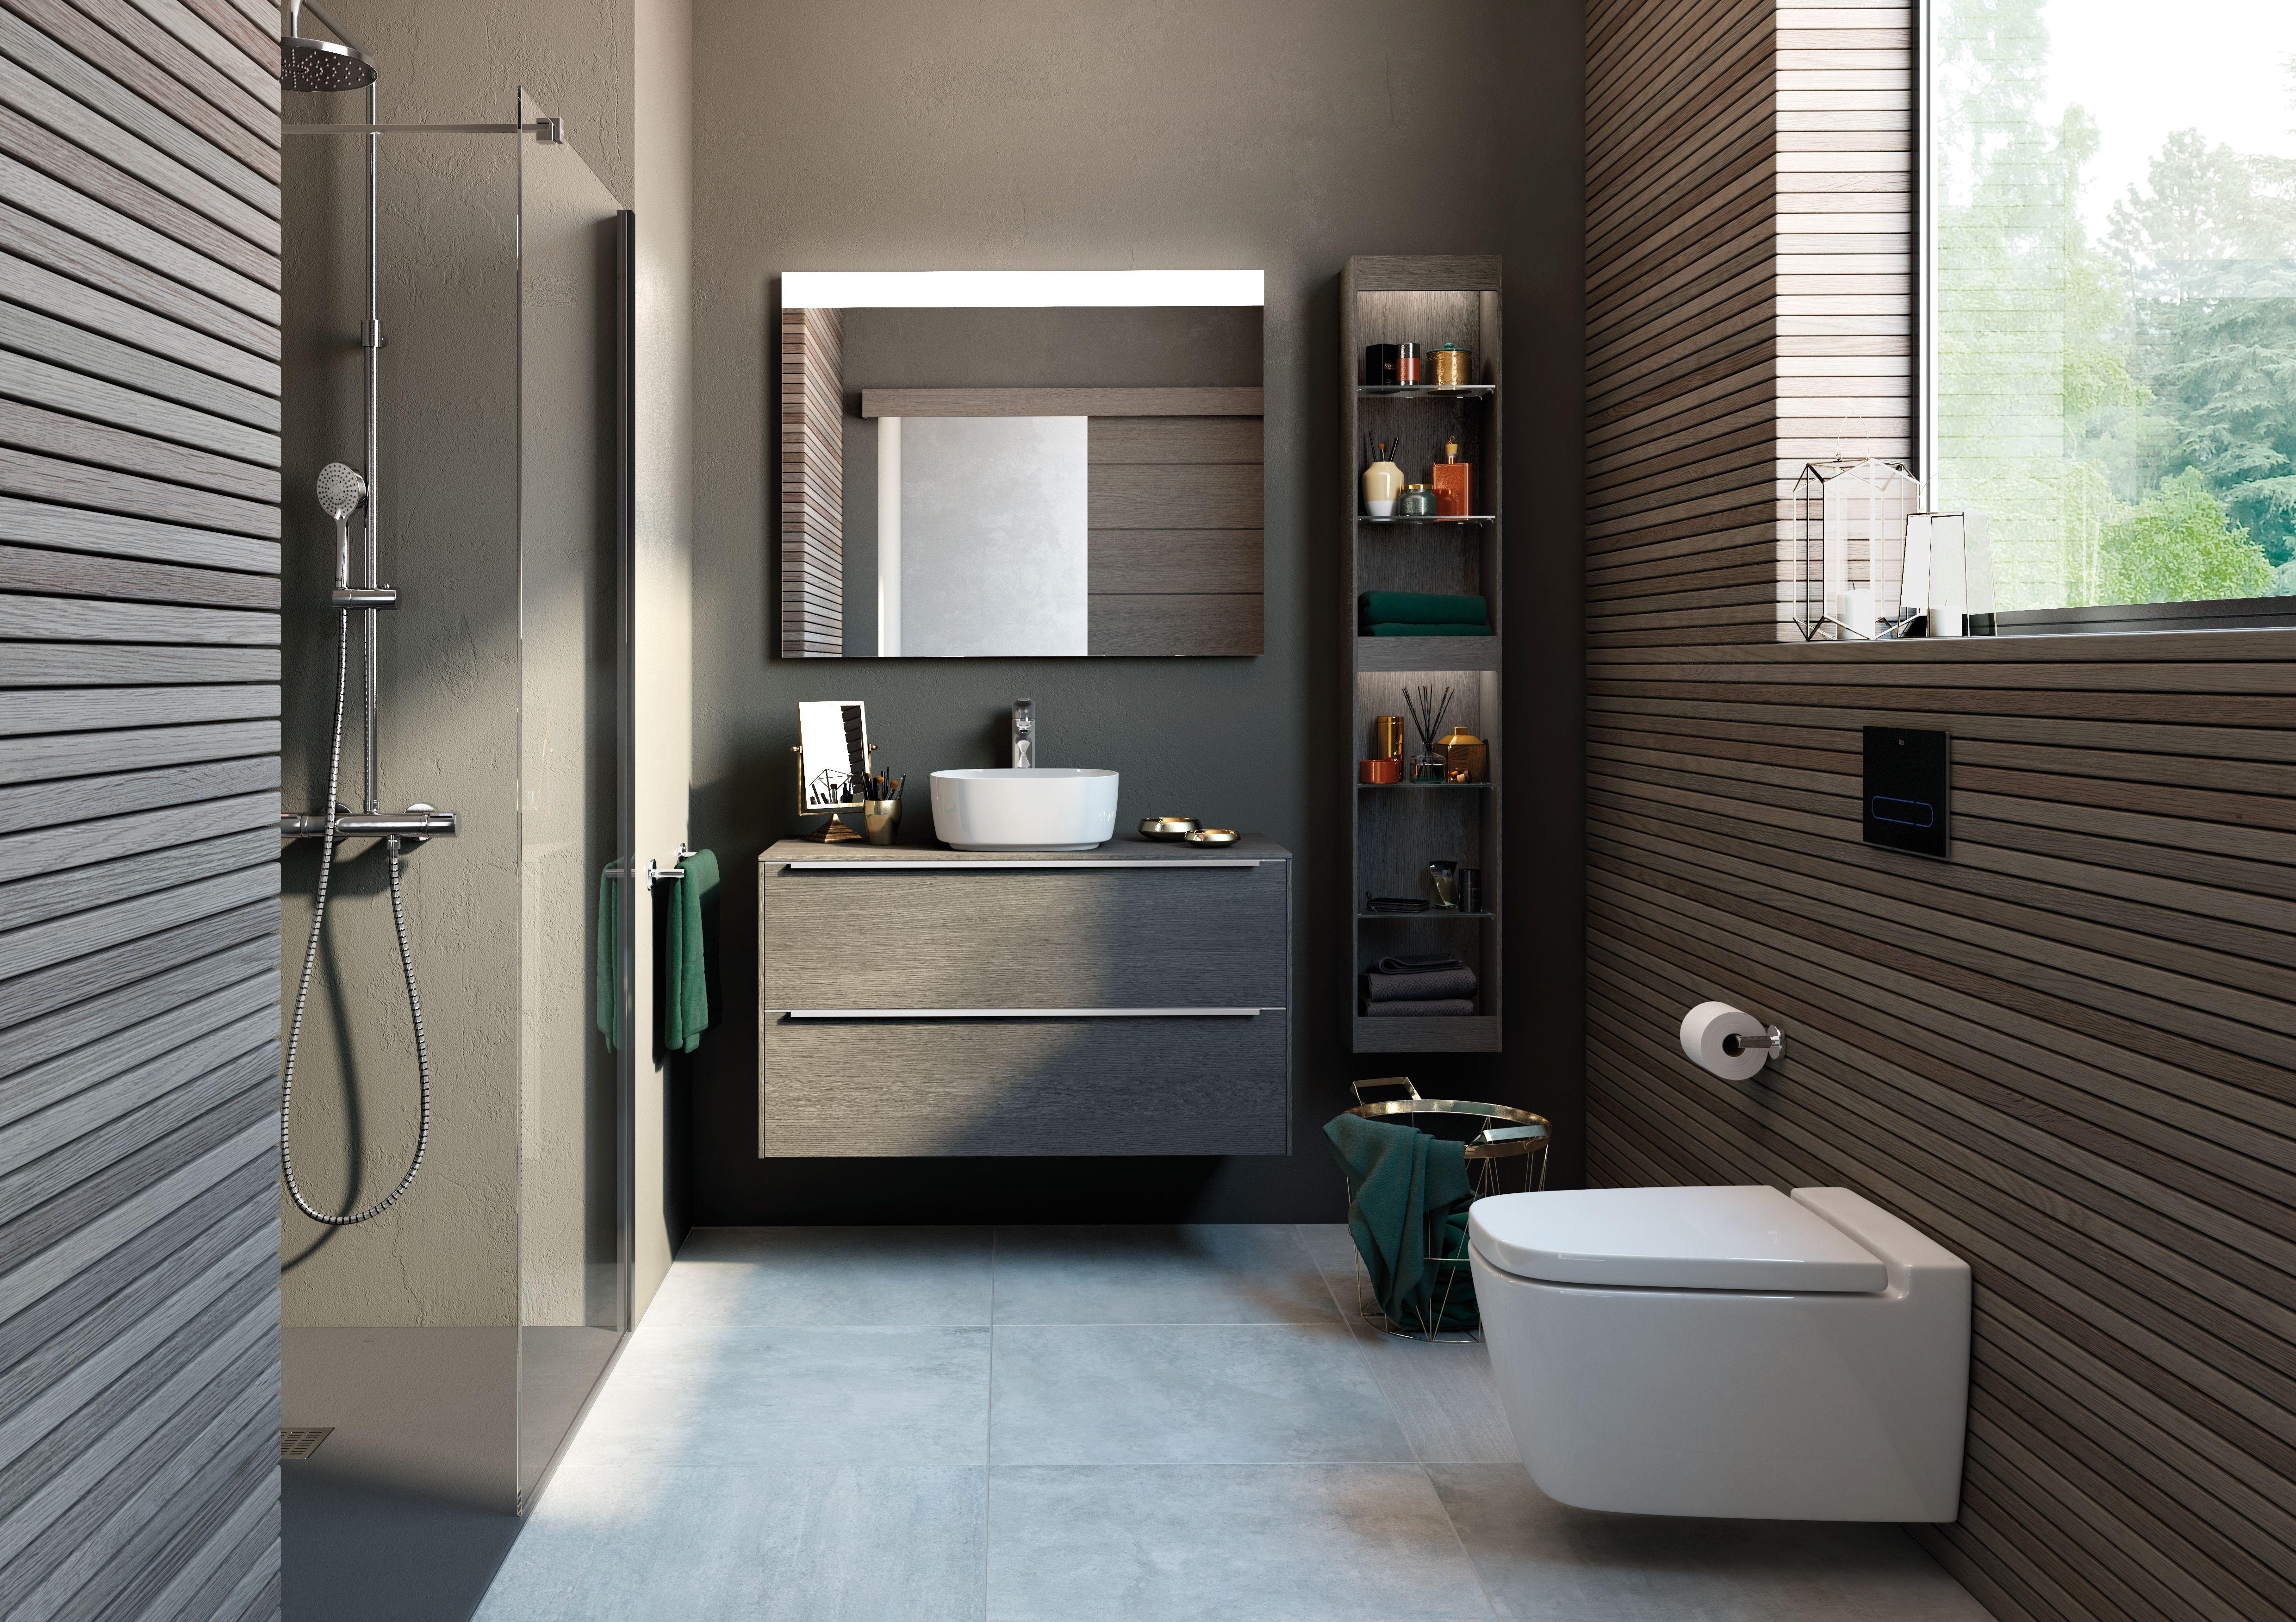 inspira de roca nouvelle salle de bain sanitaires en fine ceramic meuble tiroir miroir wc. Black Bedroom Furniture Sets. Home Design Ideas